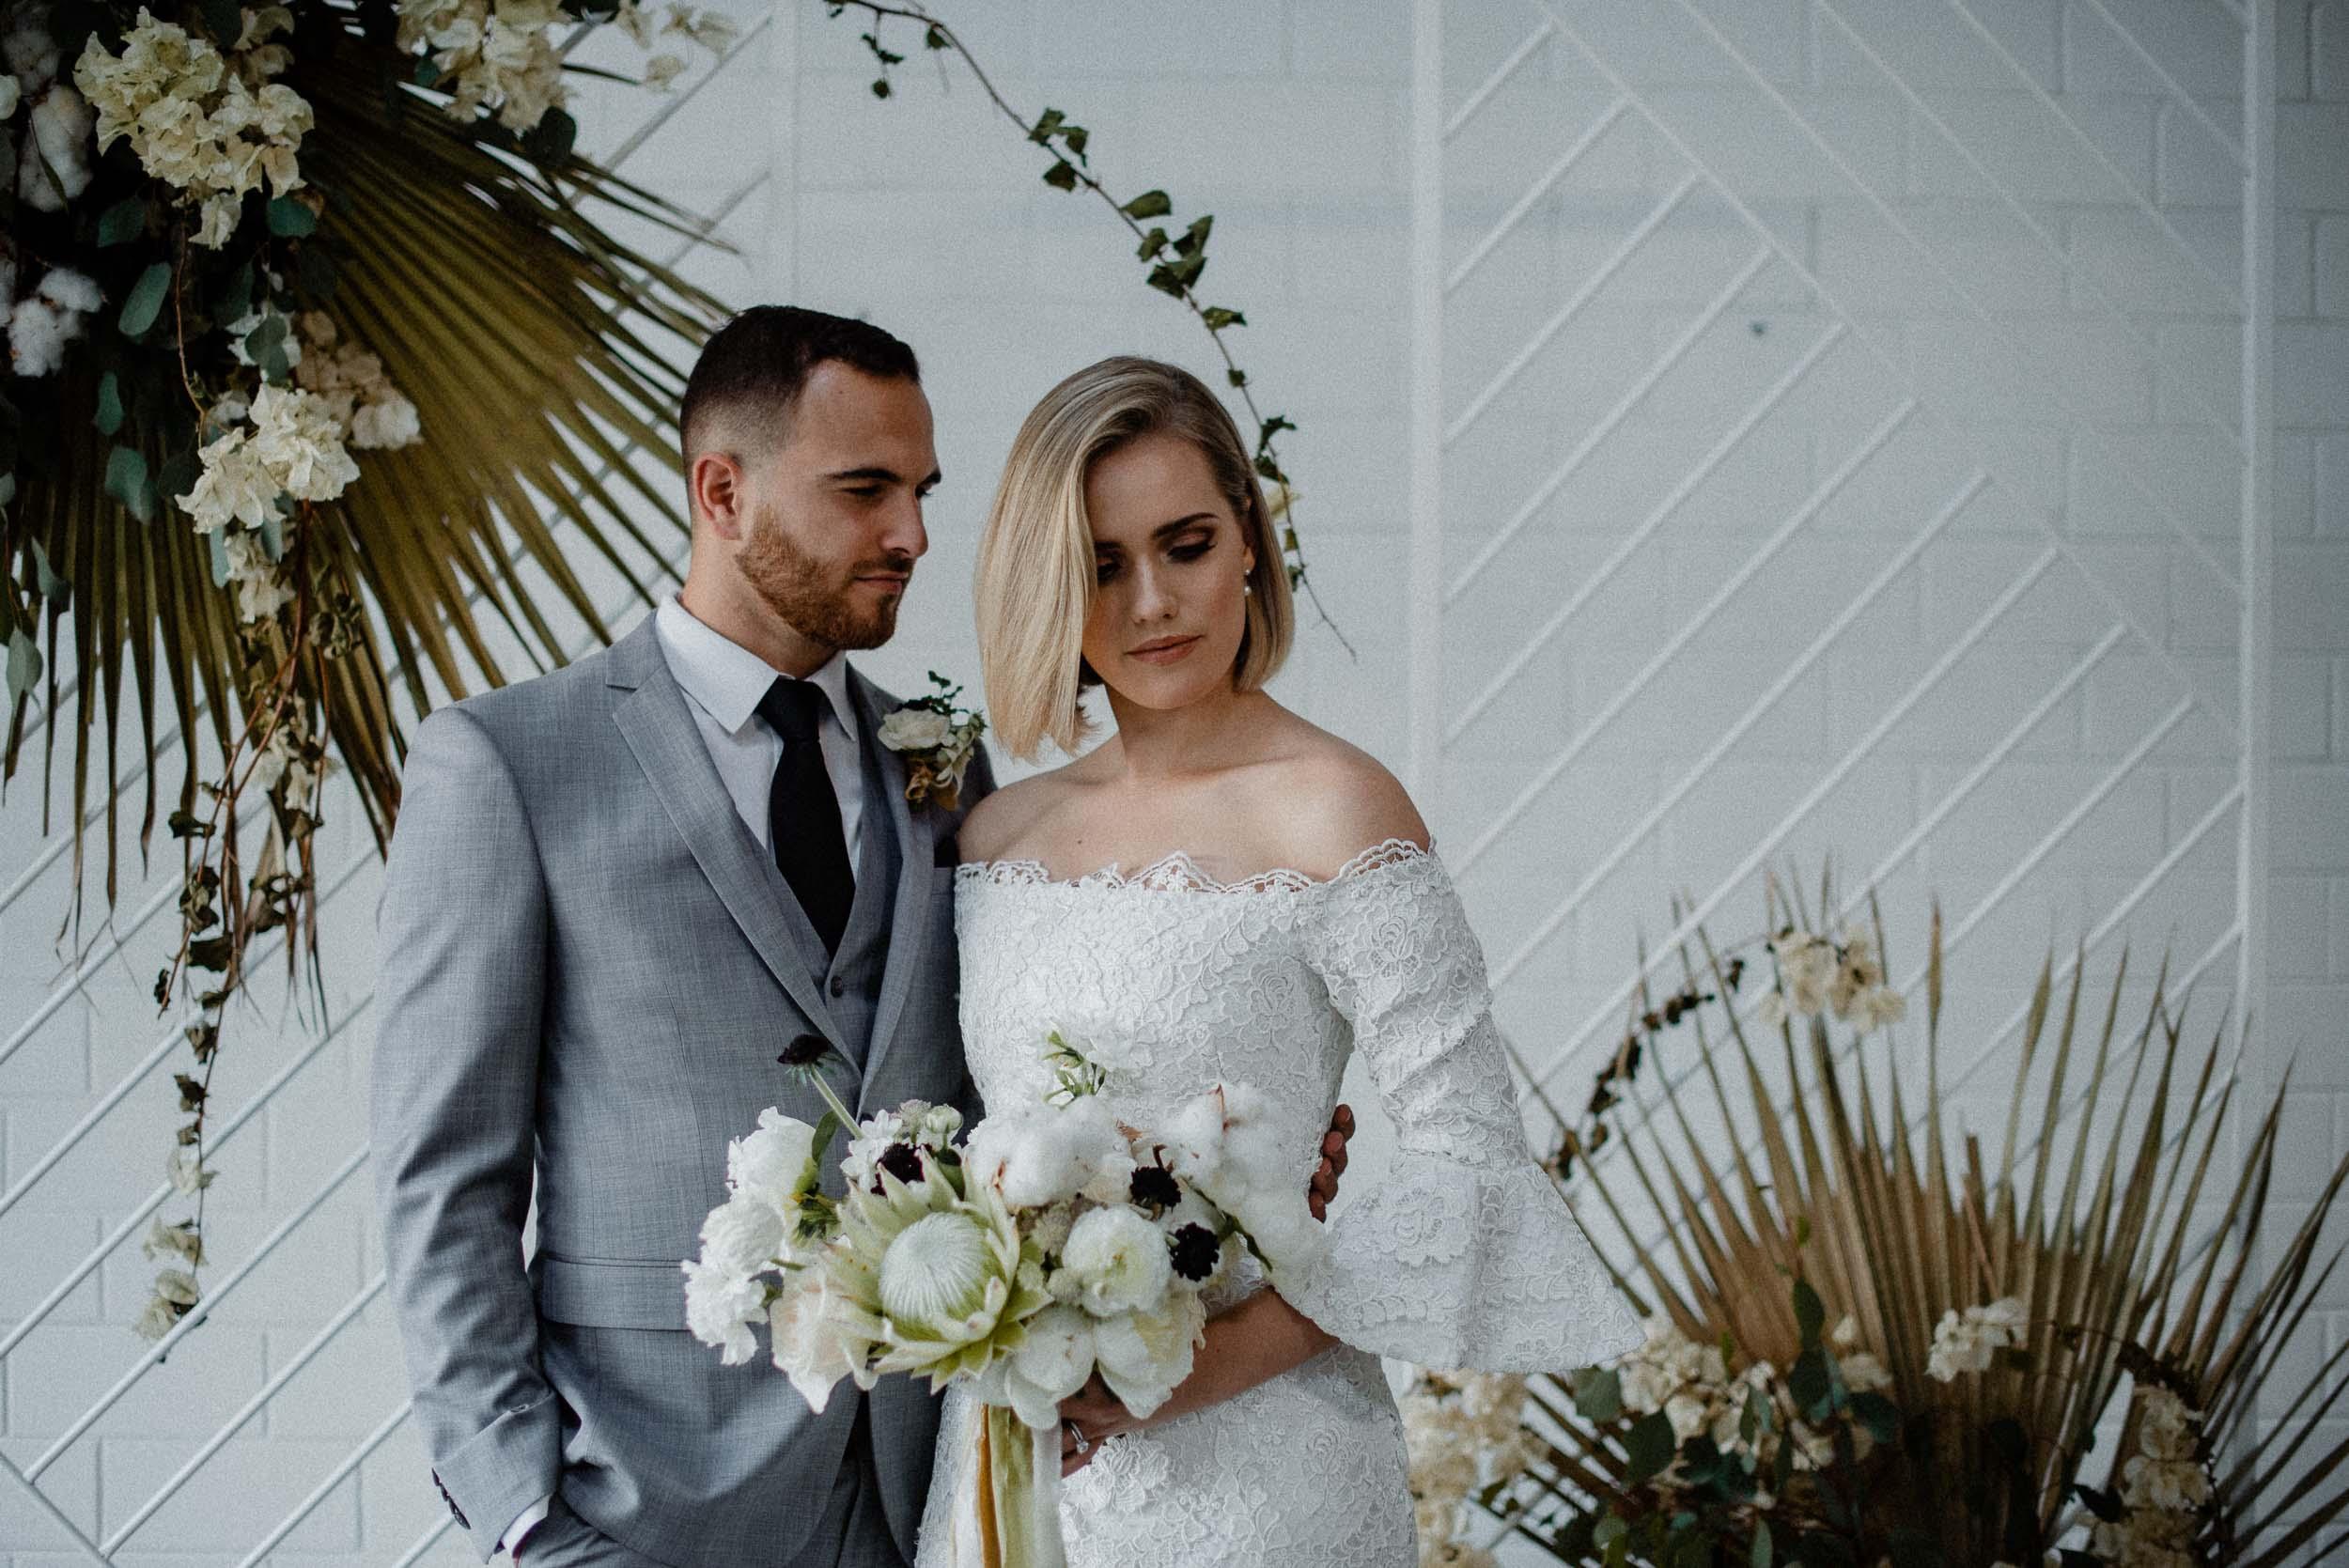 perth-botanical-warehouse-wedding-7.JPG